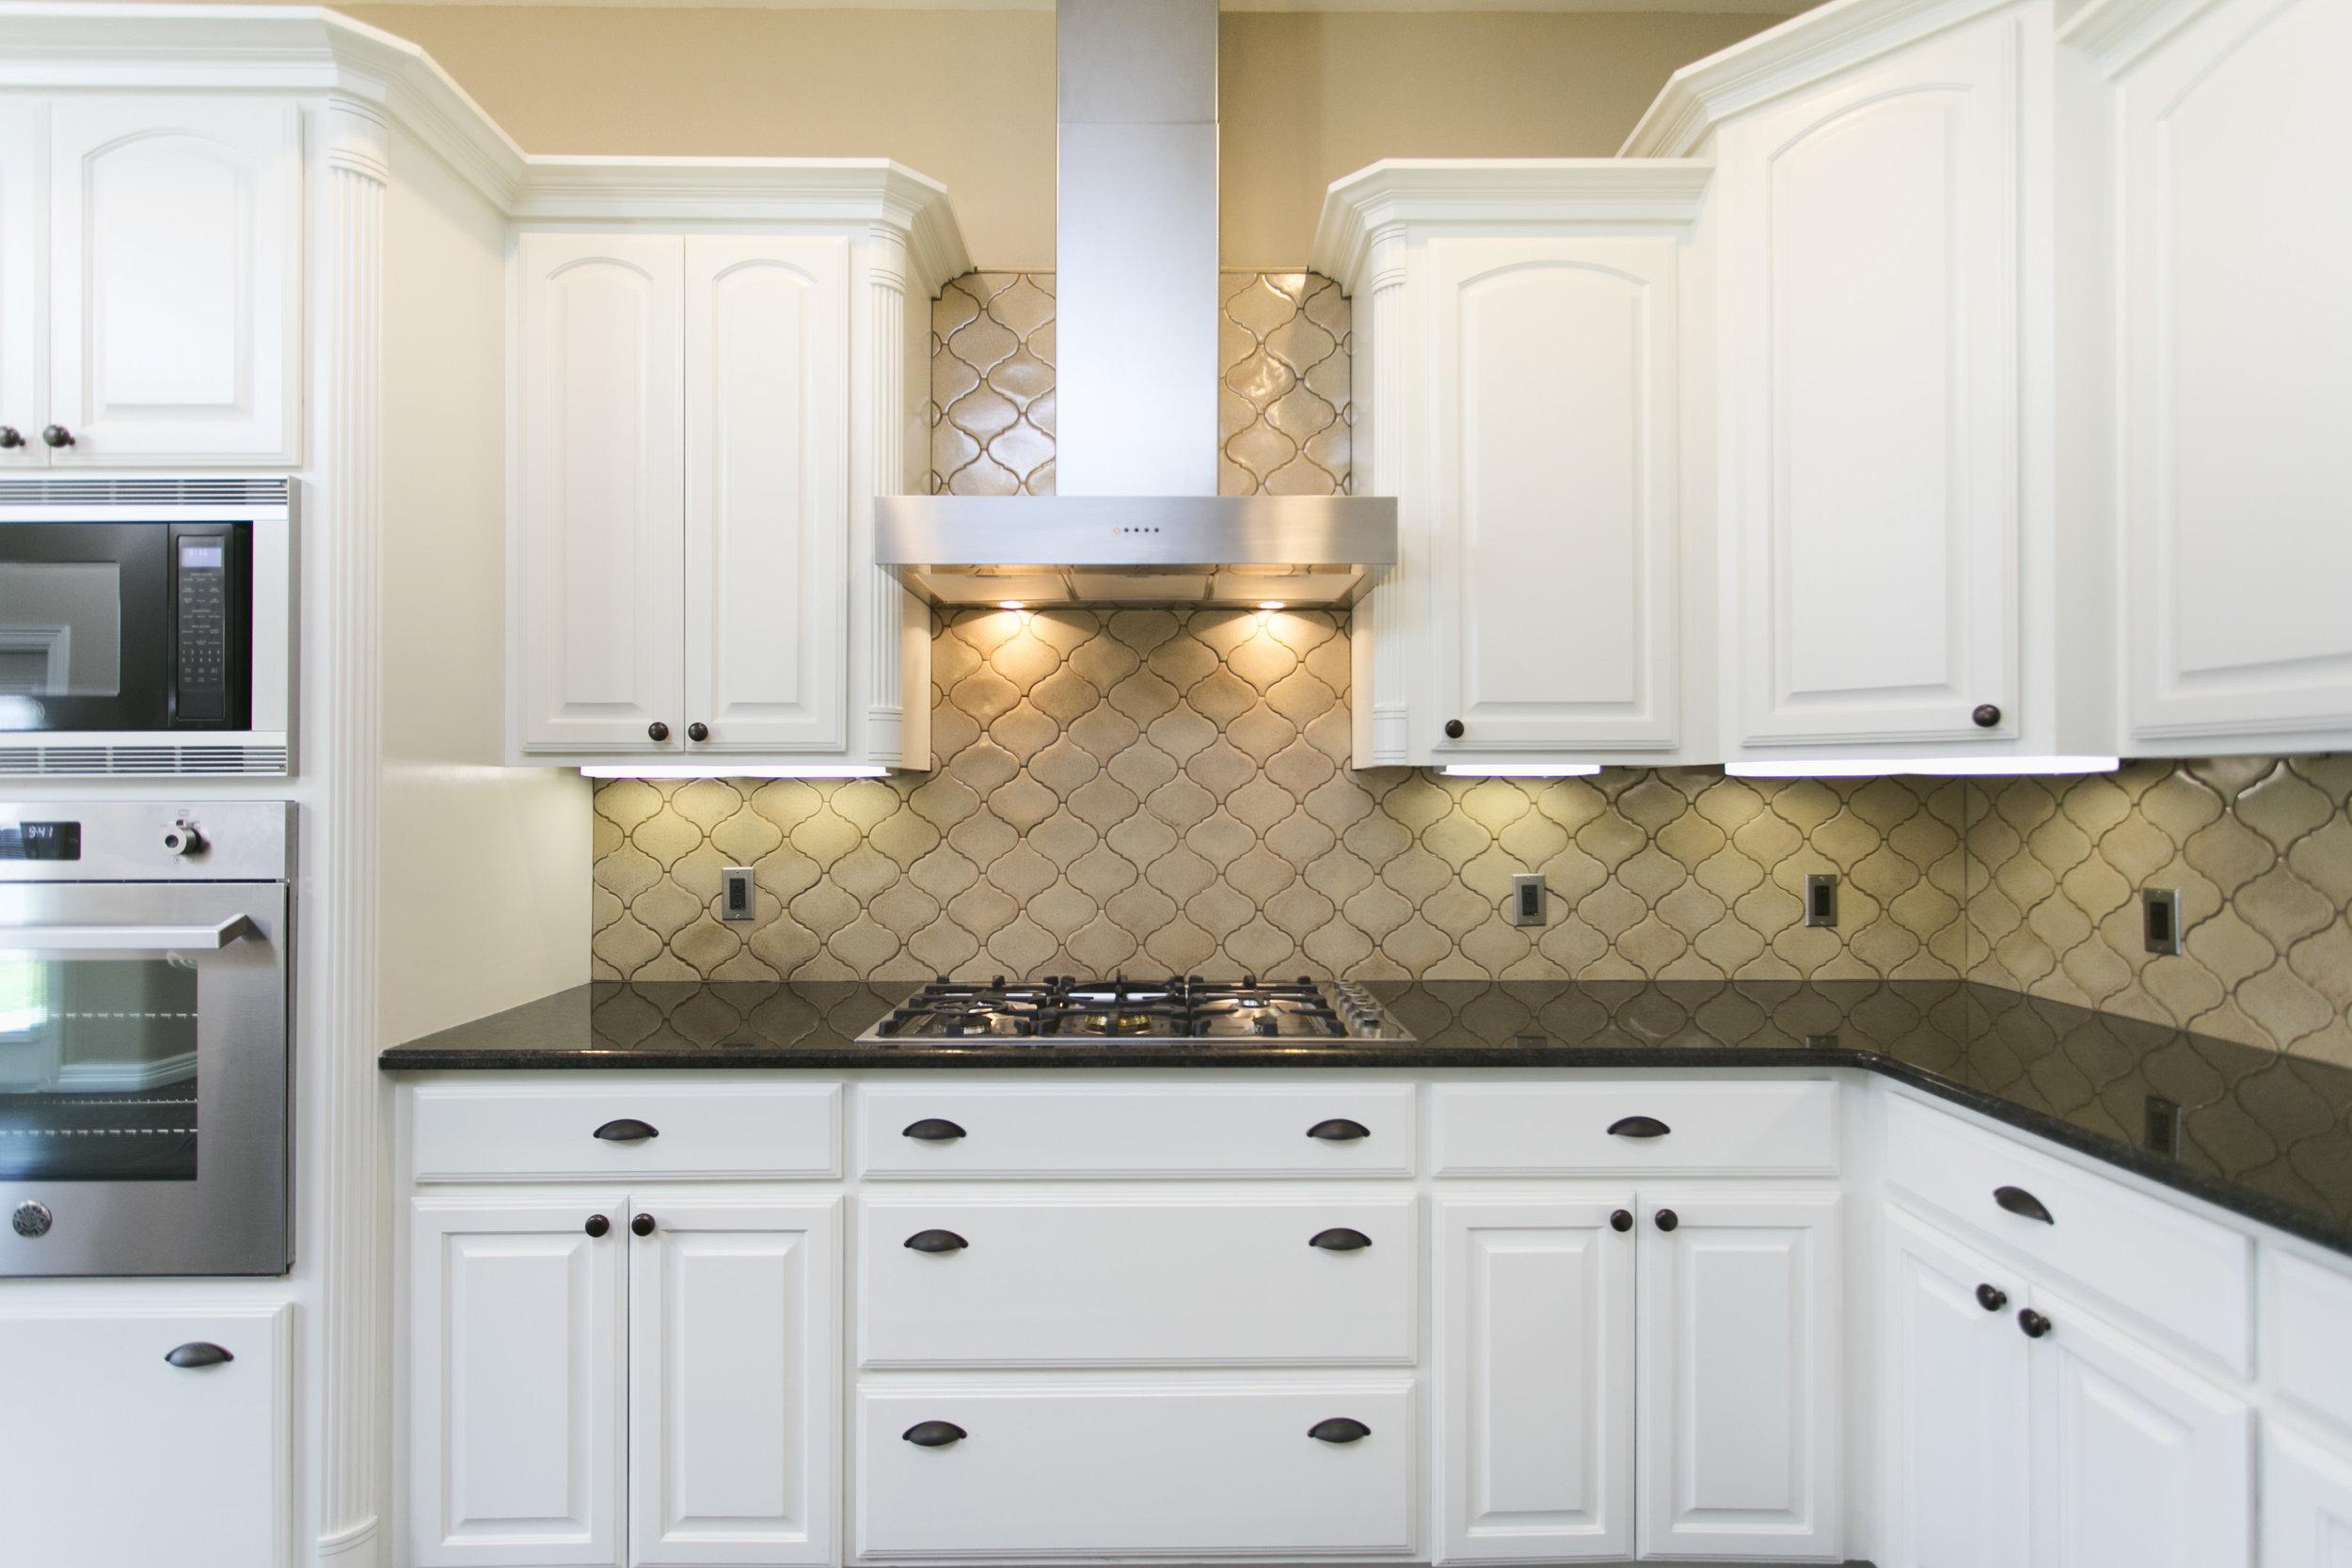 Kitchen Six1.jpg